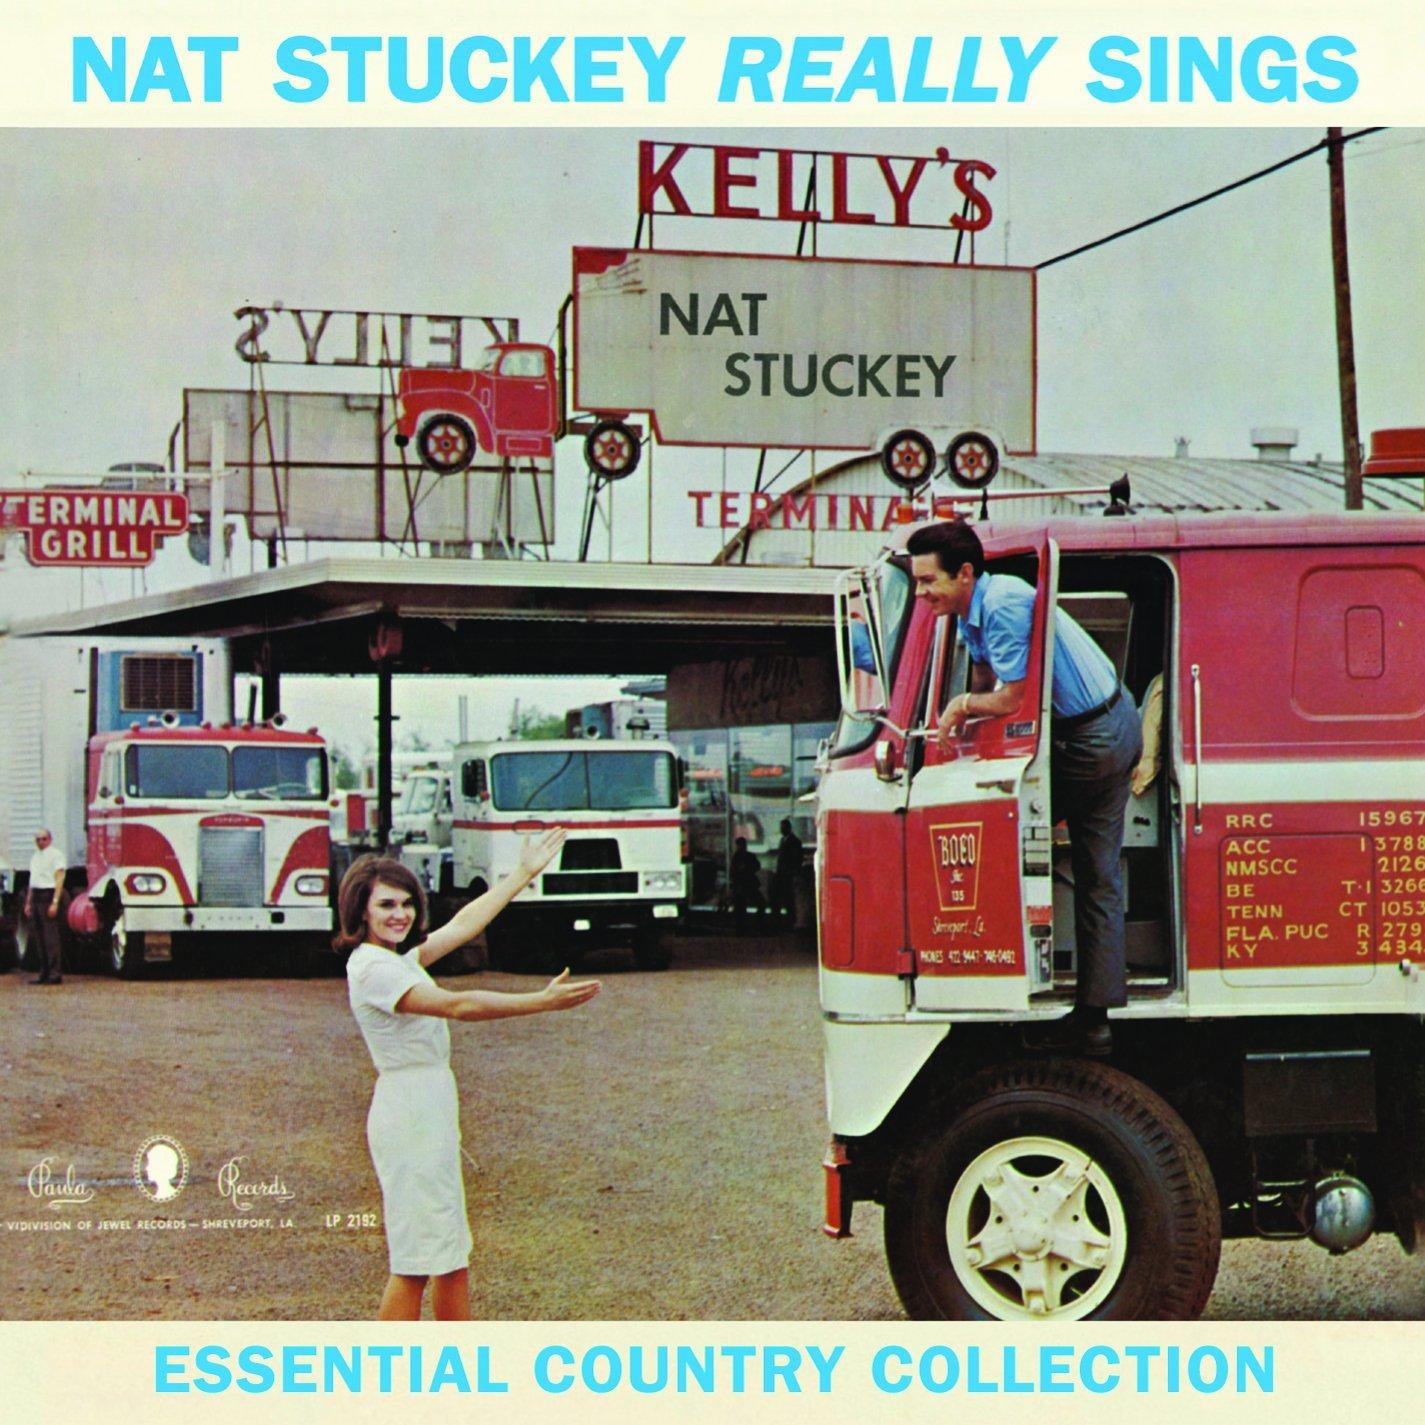 Nat Stuckey Really Sings                                                                                                                                                                                                                                                                                                                                                                                                <span class=